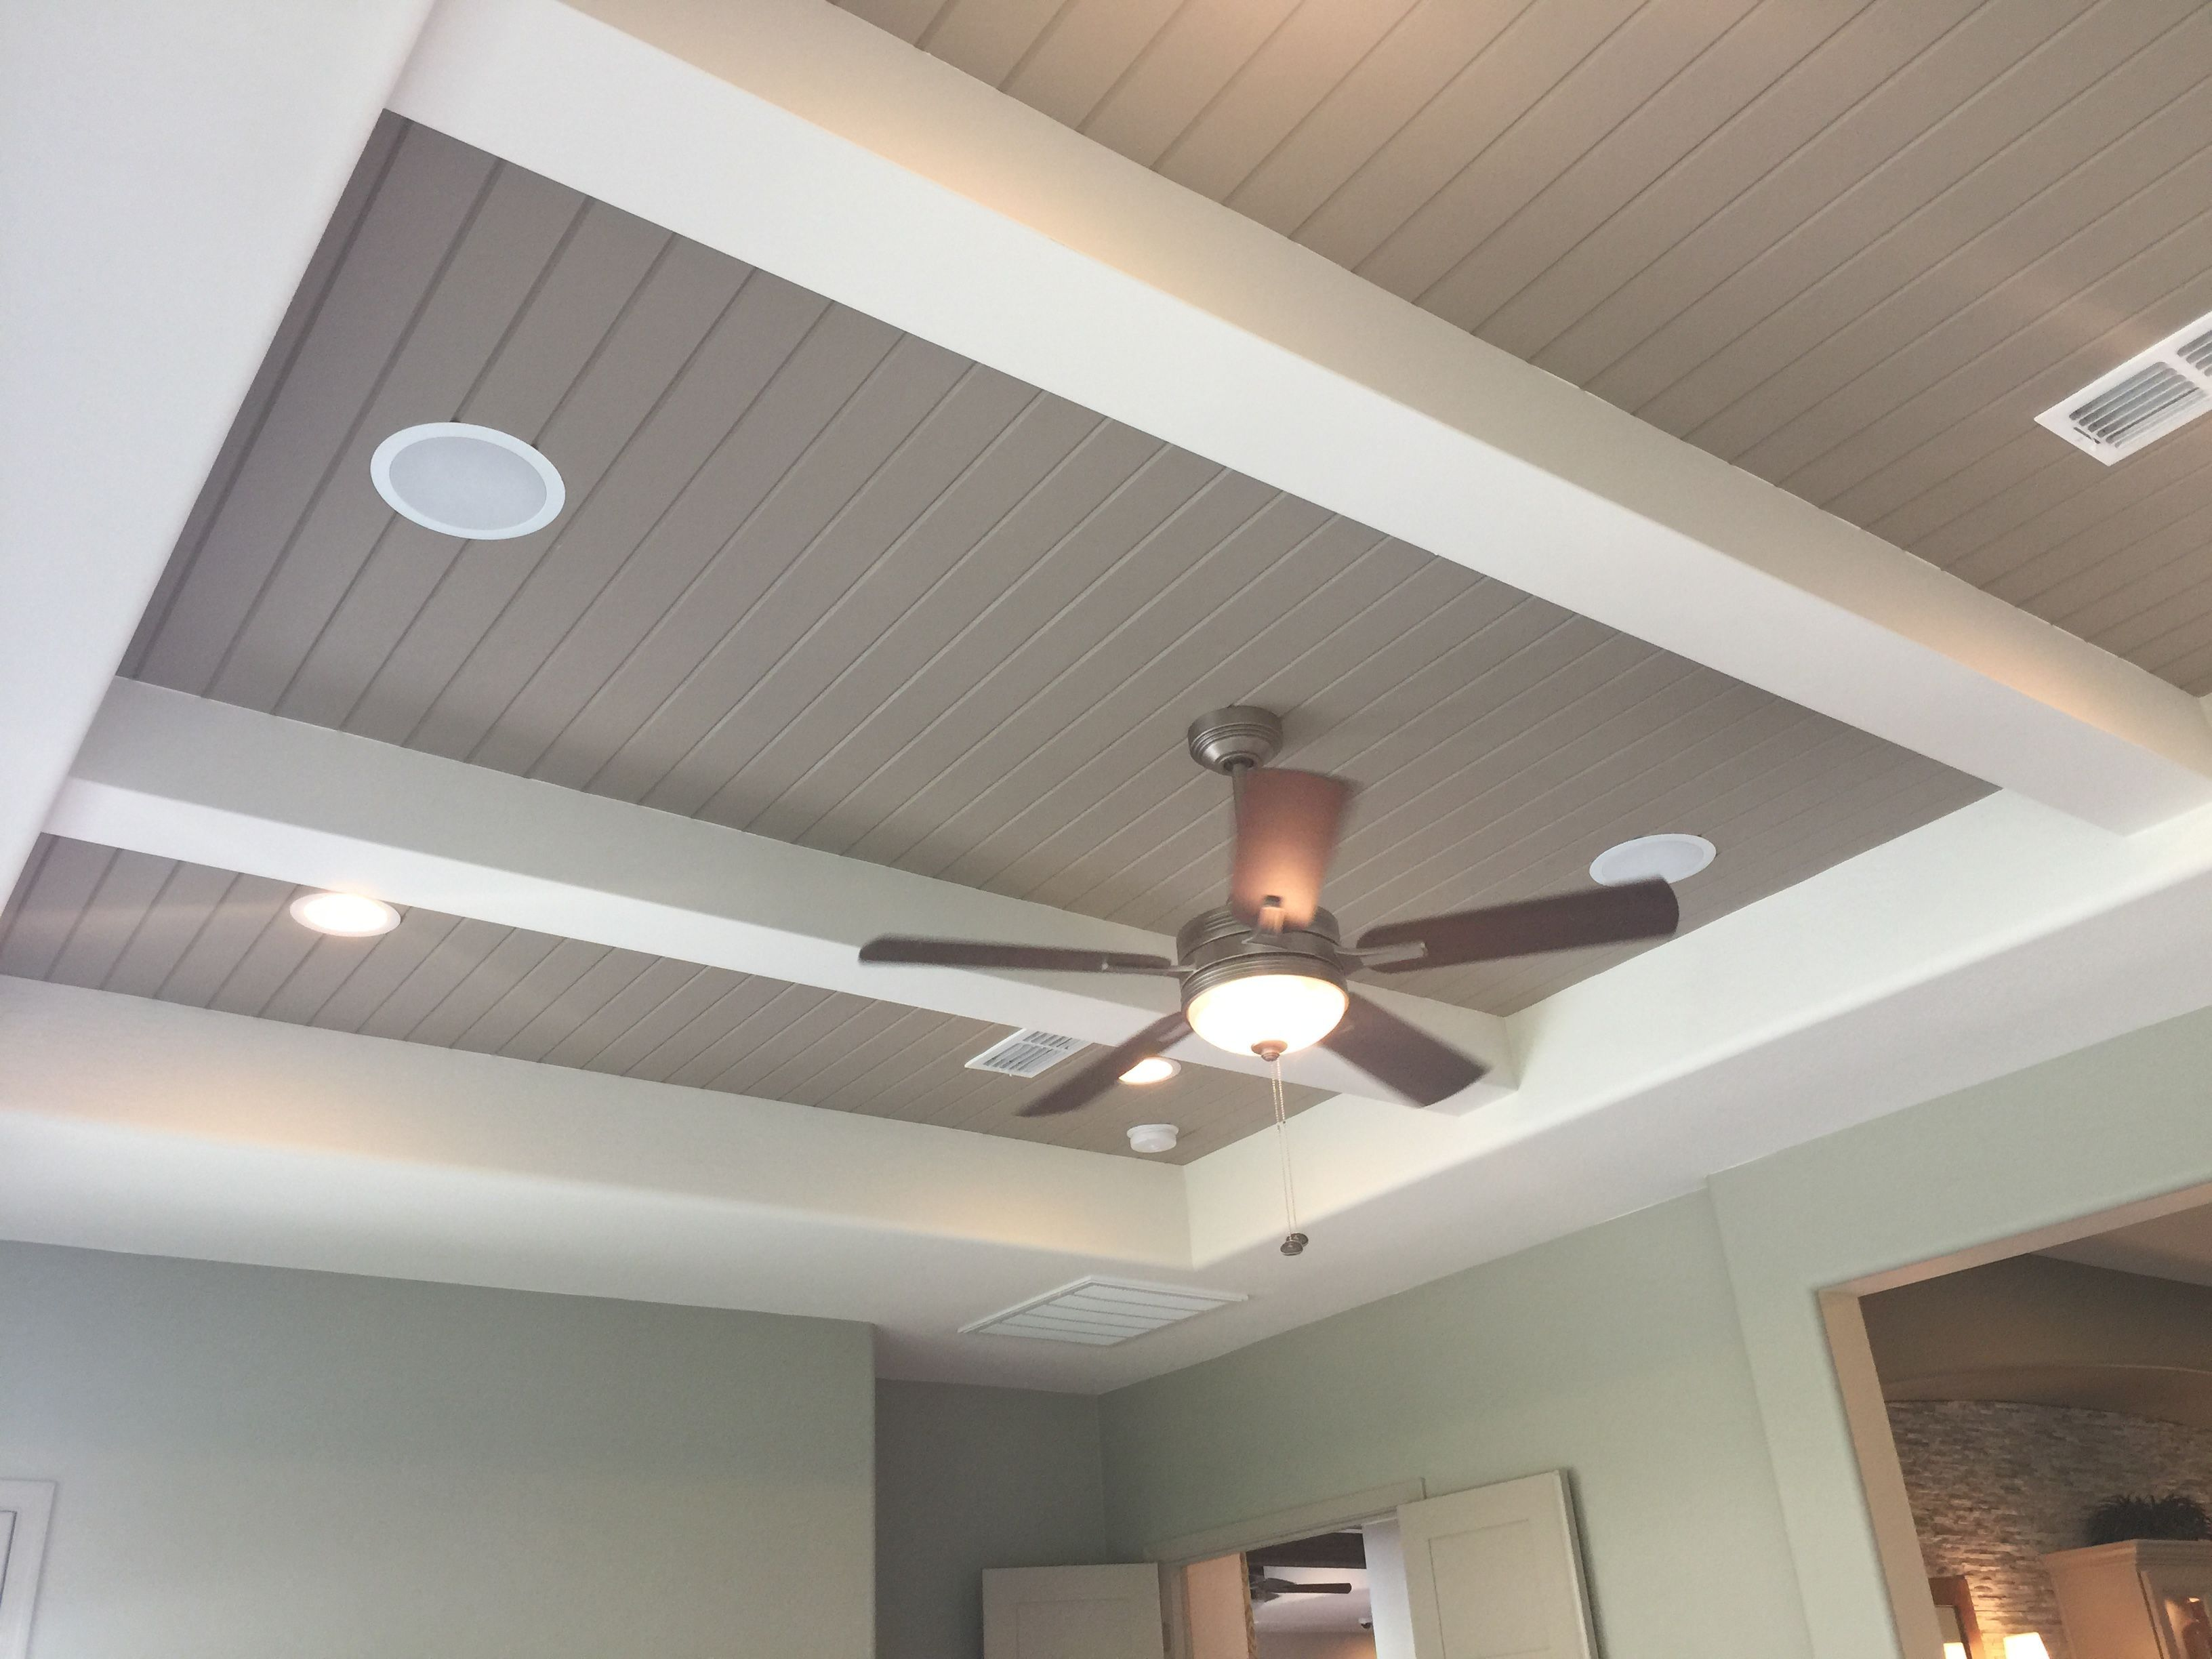 Raum mit lichtern um falseceilingdiningfloors  false ceiling dining floors  pinterest